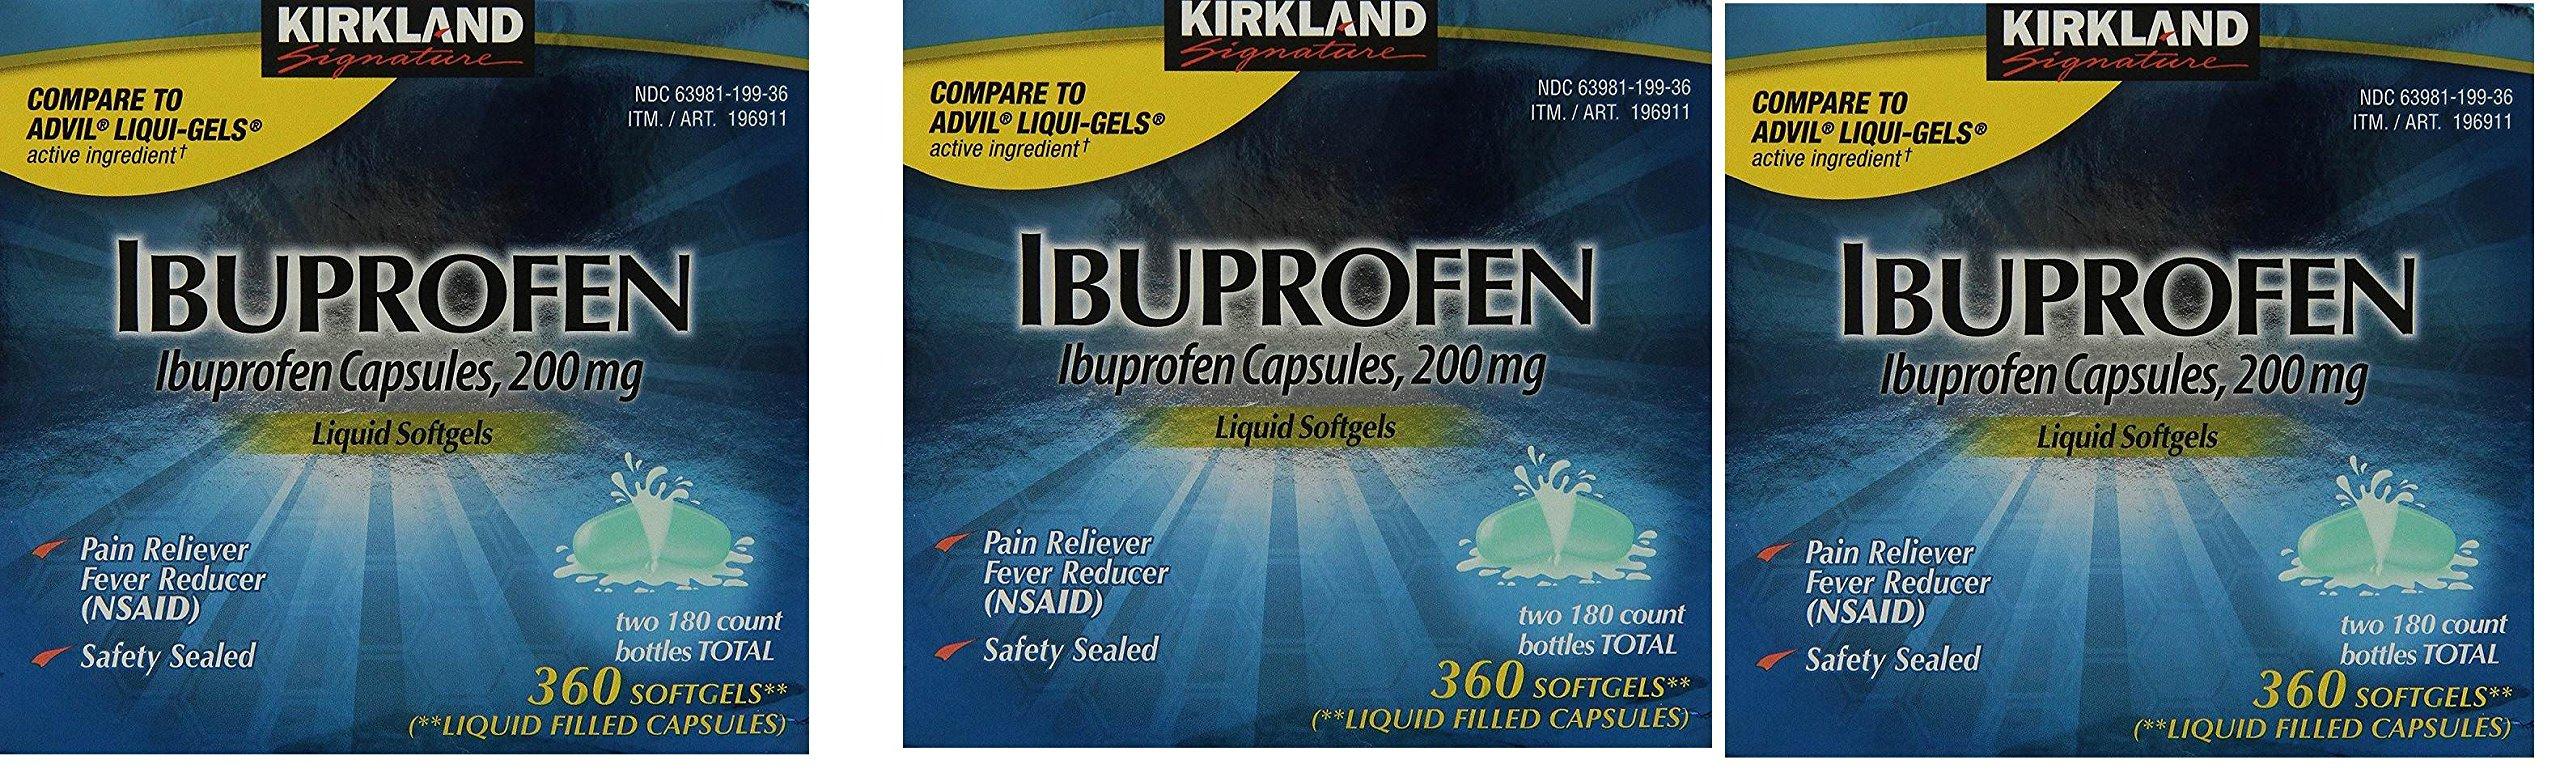 Kirkland Signature Brand Ibuprofen Liquid Softgels 200mg, 3 Packages(360 Capsules) by Kirkland Signature